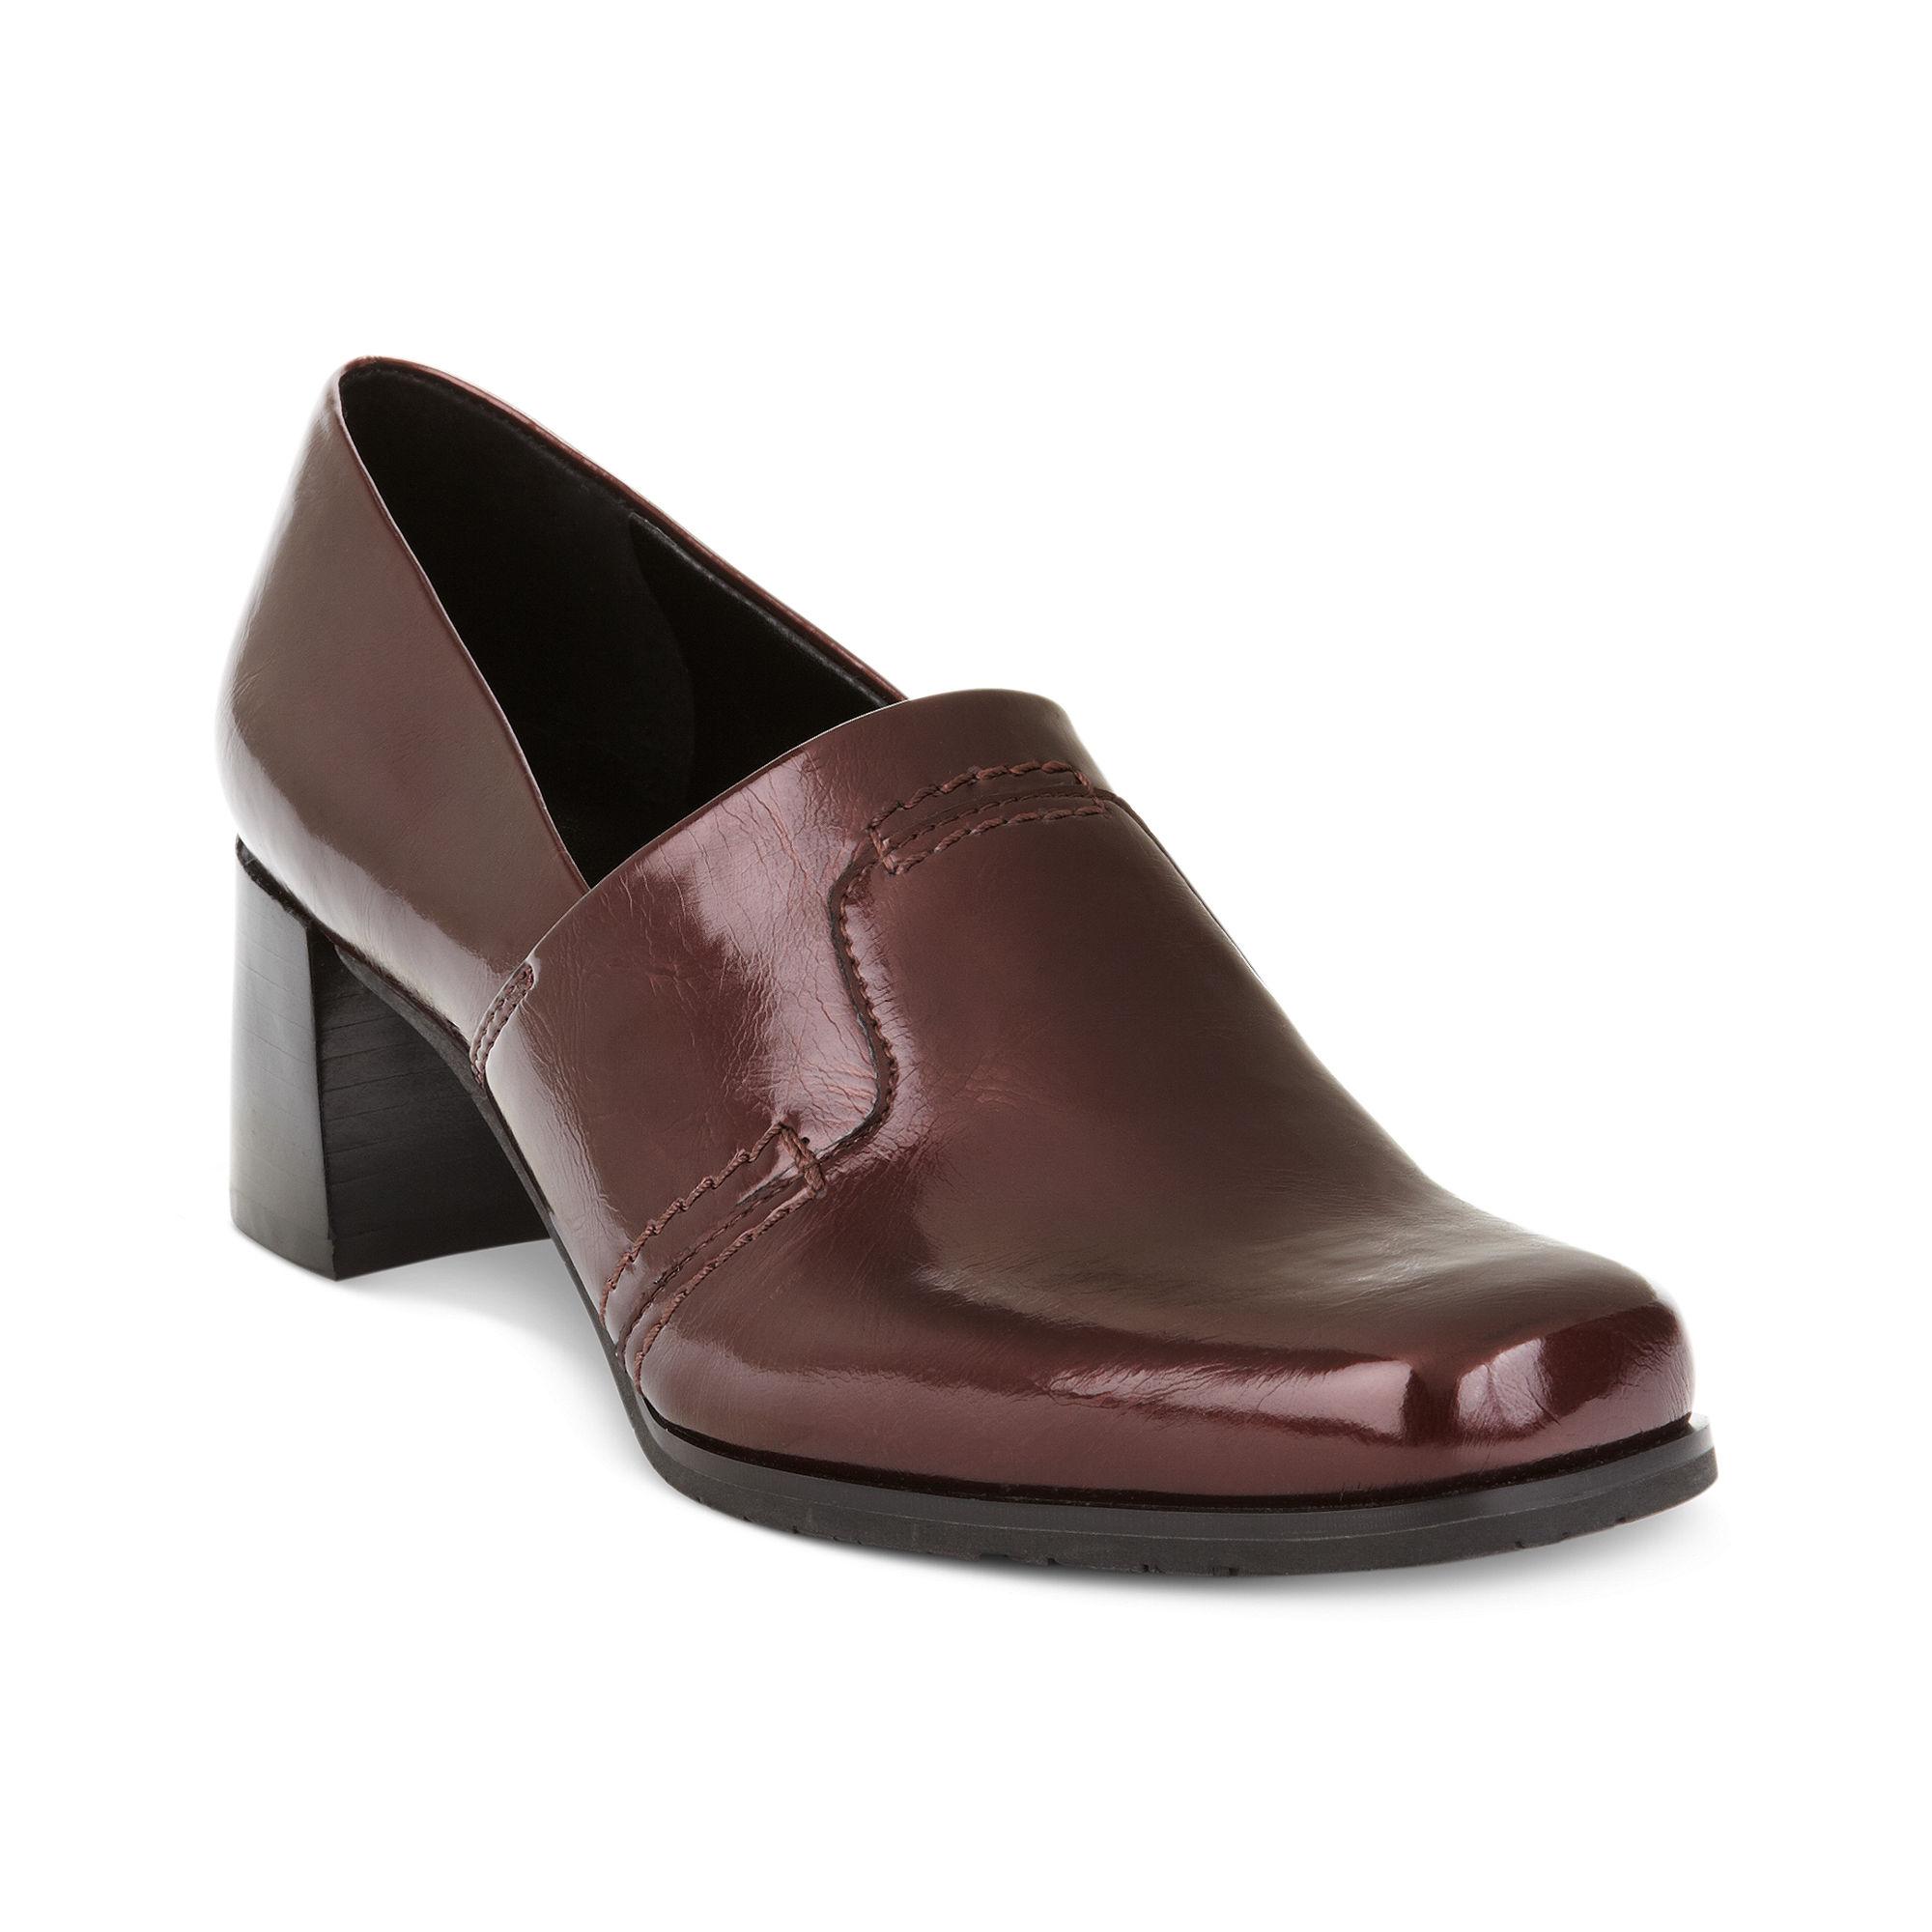 Franco Sarto Shoes Uk